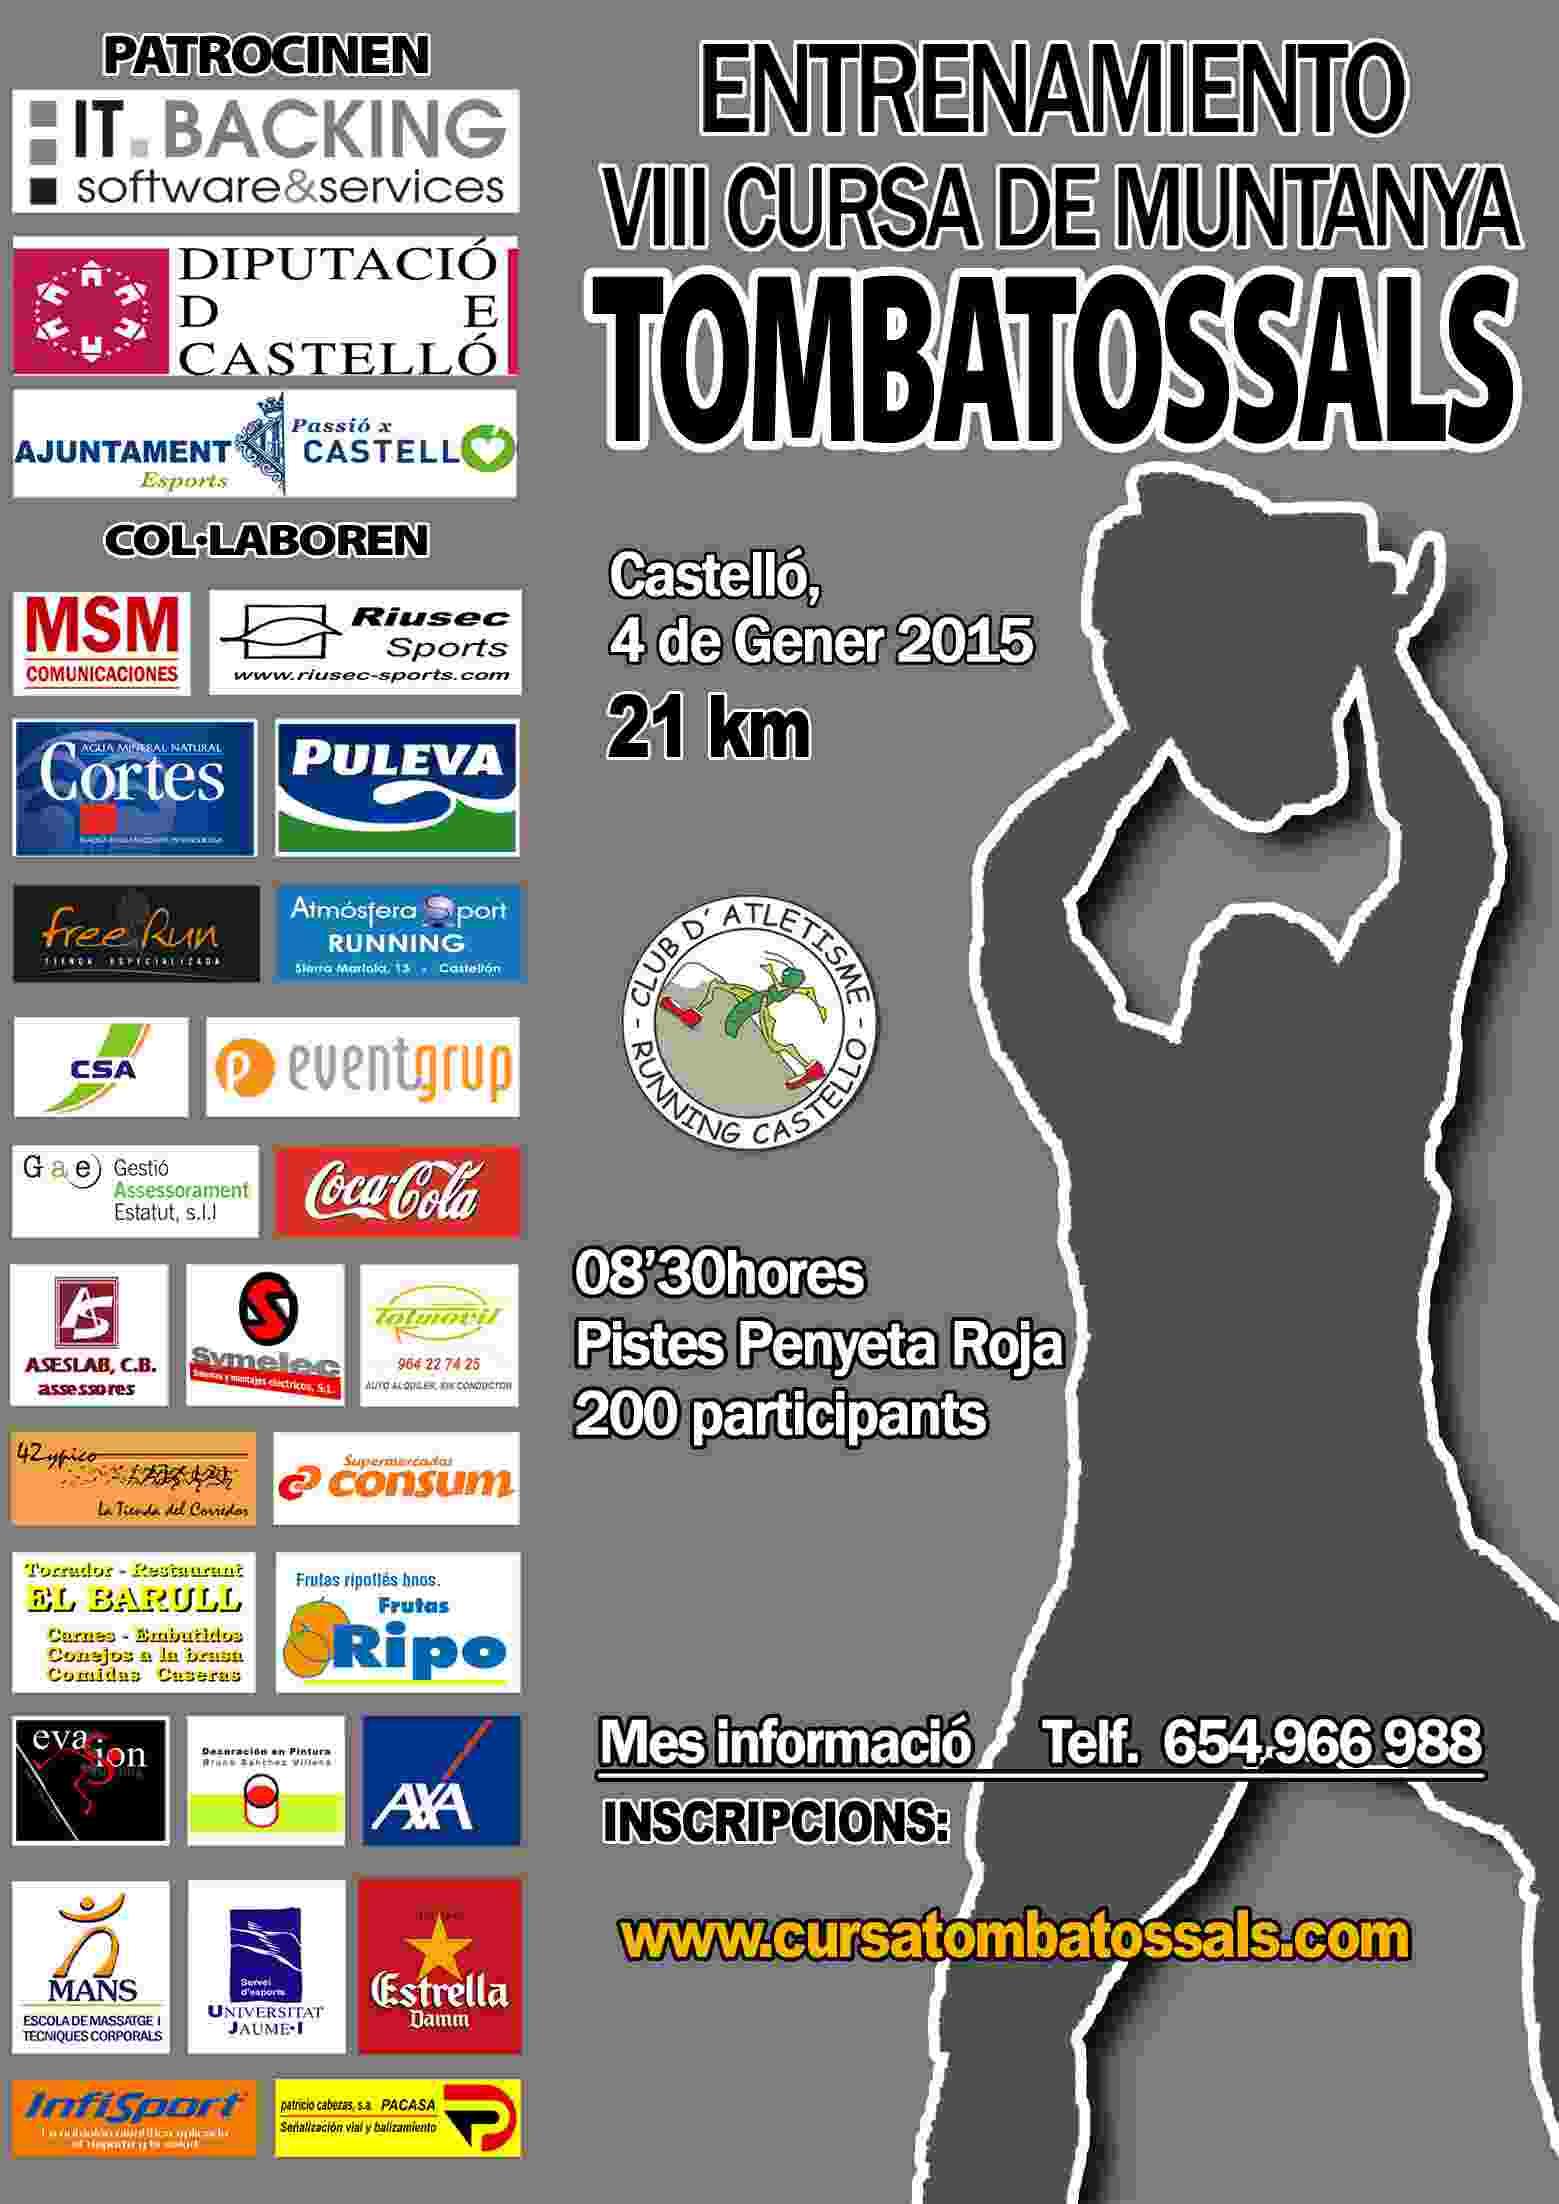 ENTRENE CURSA TOMBATOSSALS - Register